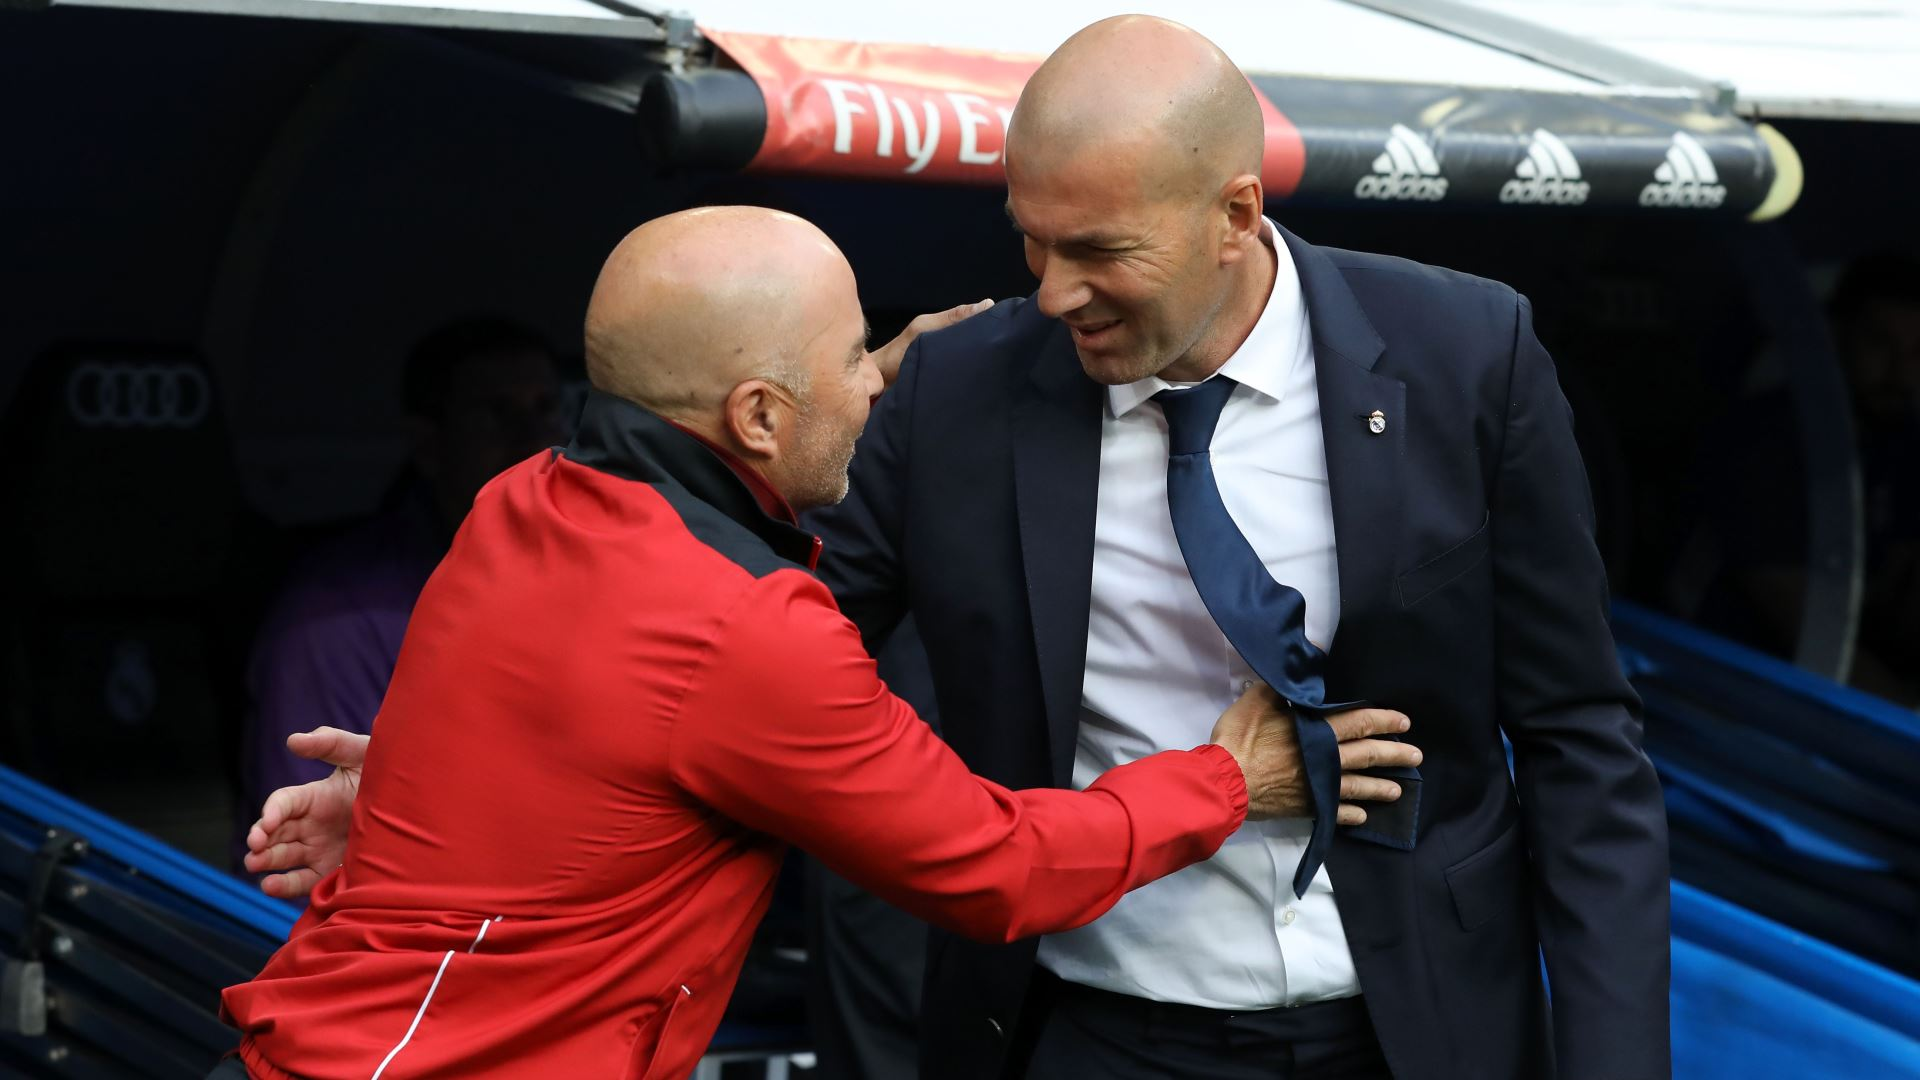 Sampaoli convocó a Icardi y no llamó a Agüero ni a Lavezzi